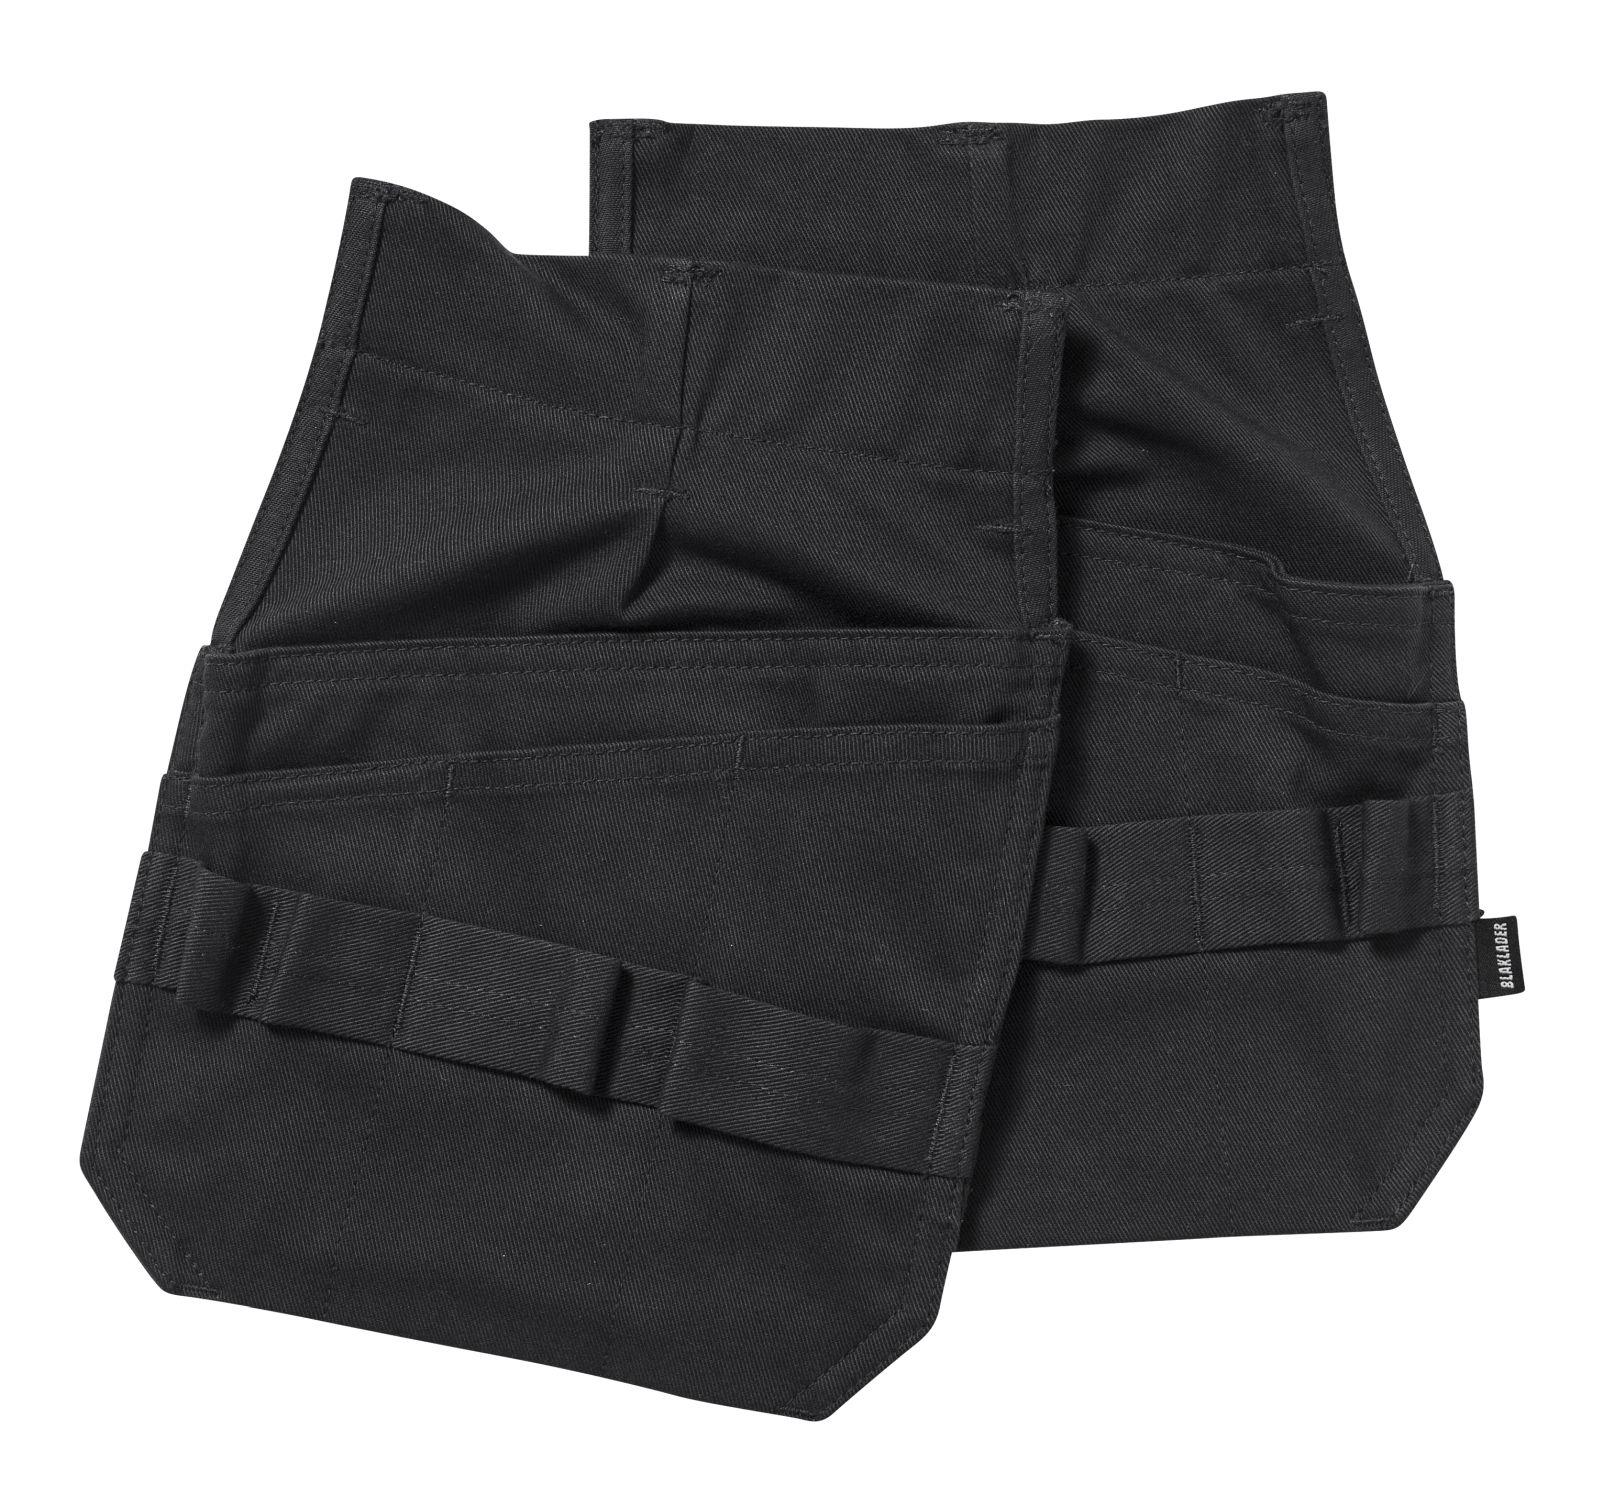 Blaklader Losse spijkerzakken 15161516 Vlamvertragend zwart(9900)